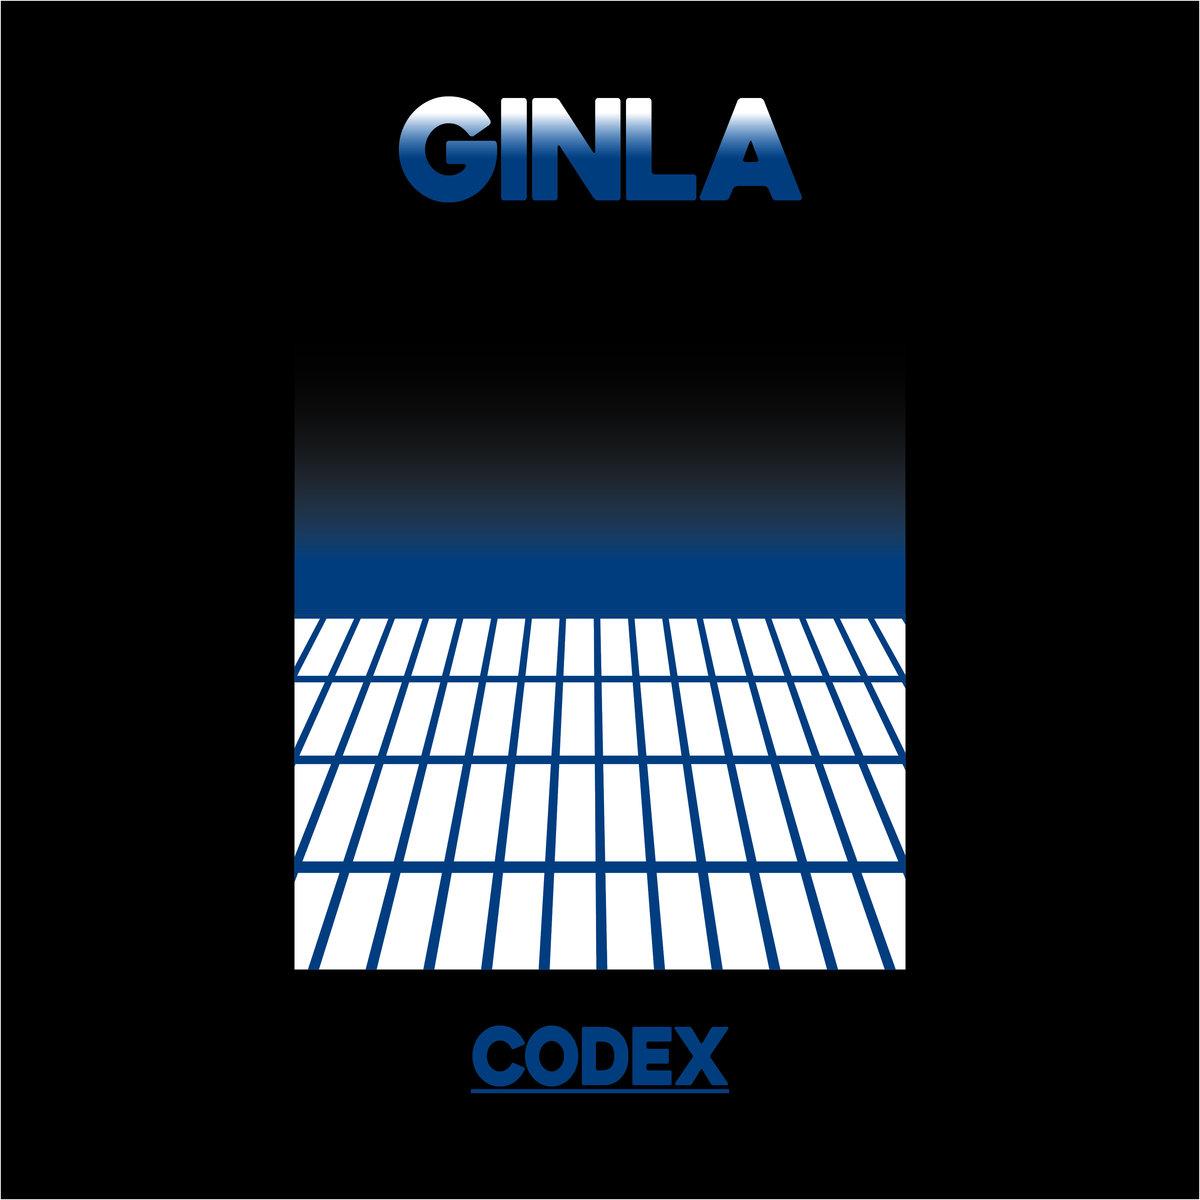 Ginla -  Codex  (mixer)